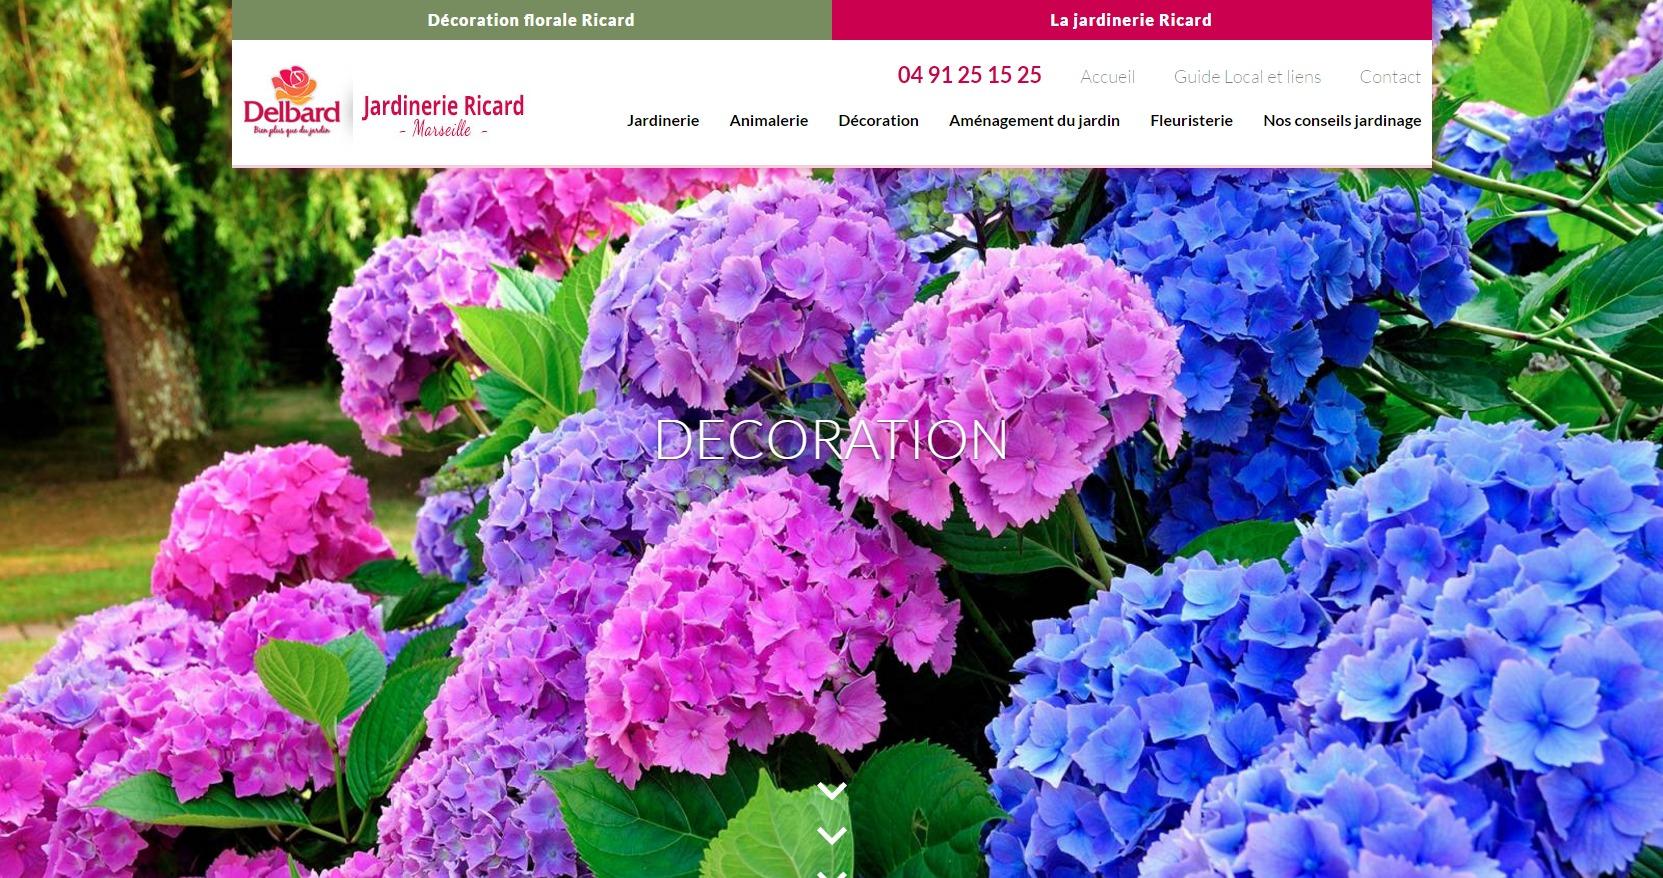 Jardinerie p pini re et animalerie marseille for Jardinerie internet